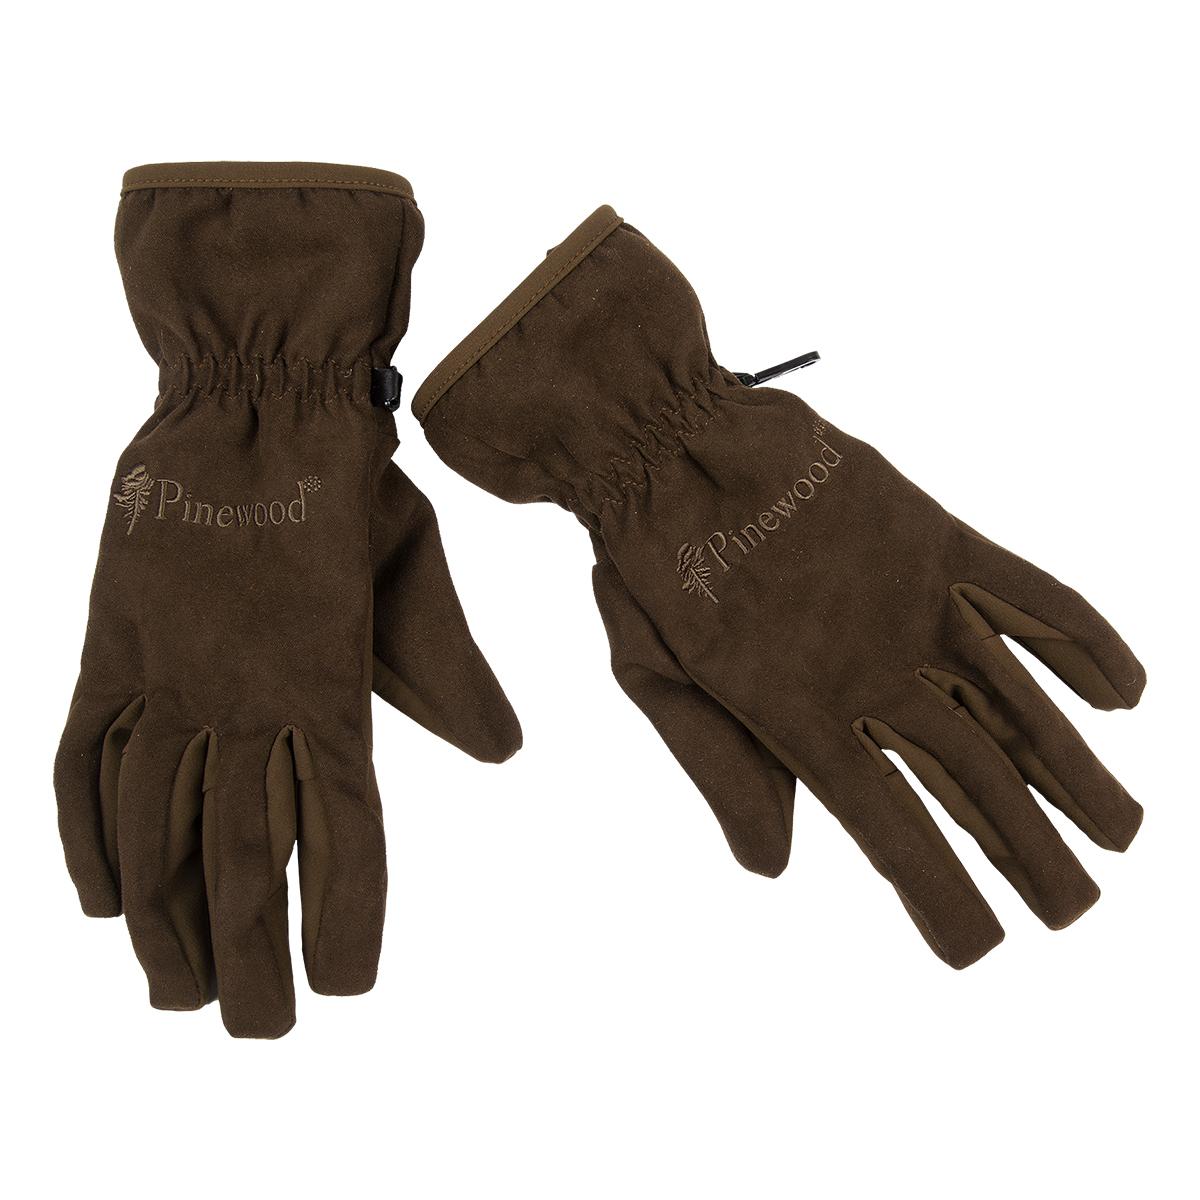 37ef0e8b2d09 Pinewood Damenhandschuhe Extreme Suede Braun im Pareyshop